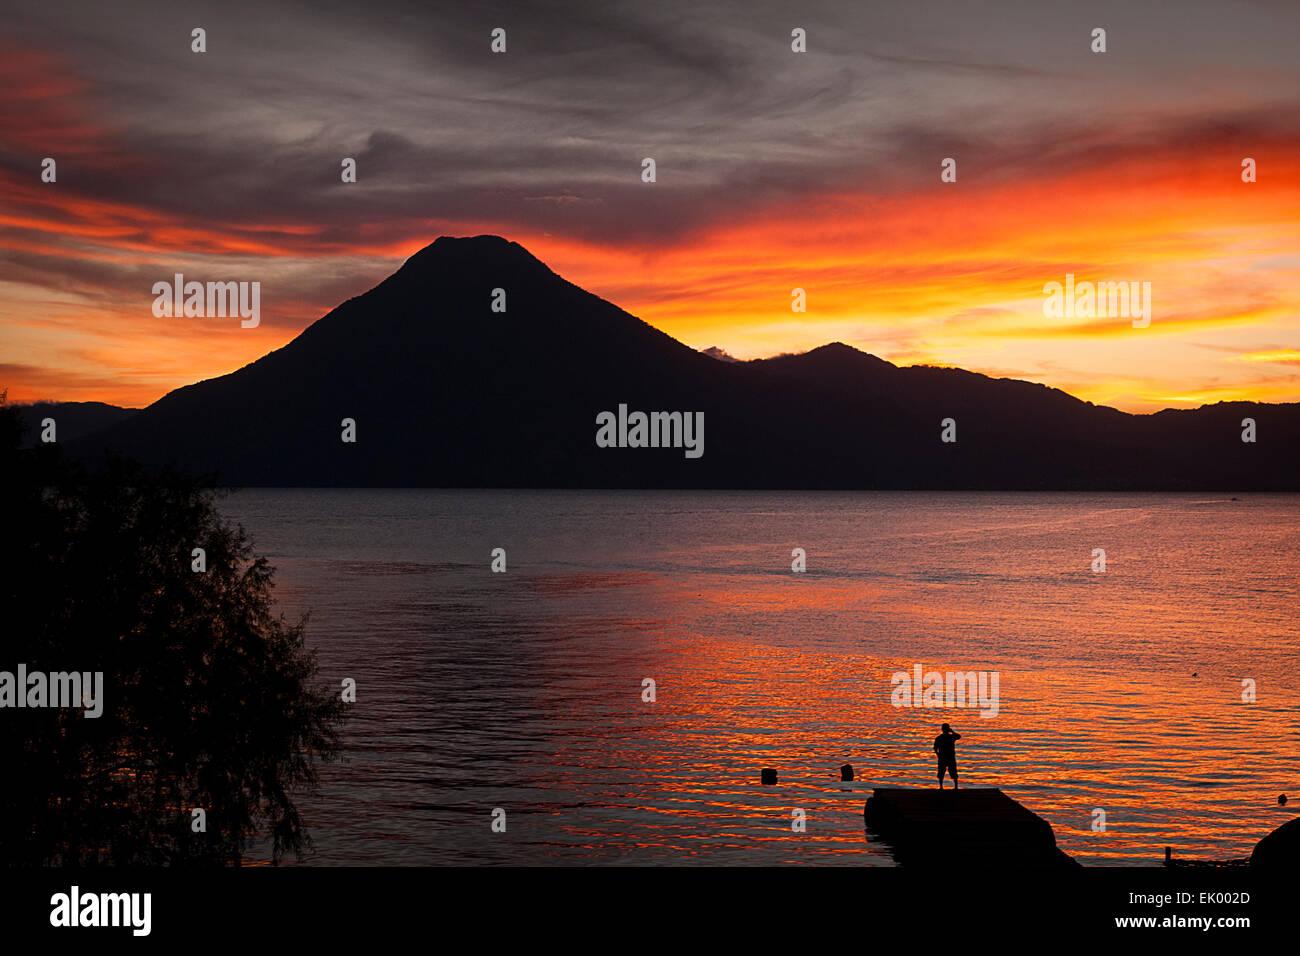 View of the Lake Atitlan from panajachel, Solola, Guatemala, Central America - Stock Image